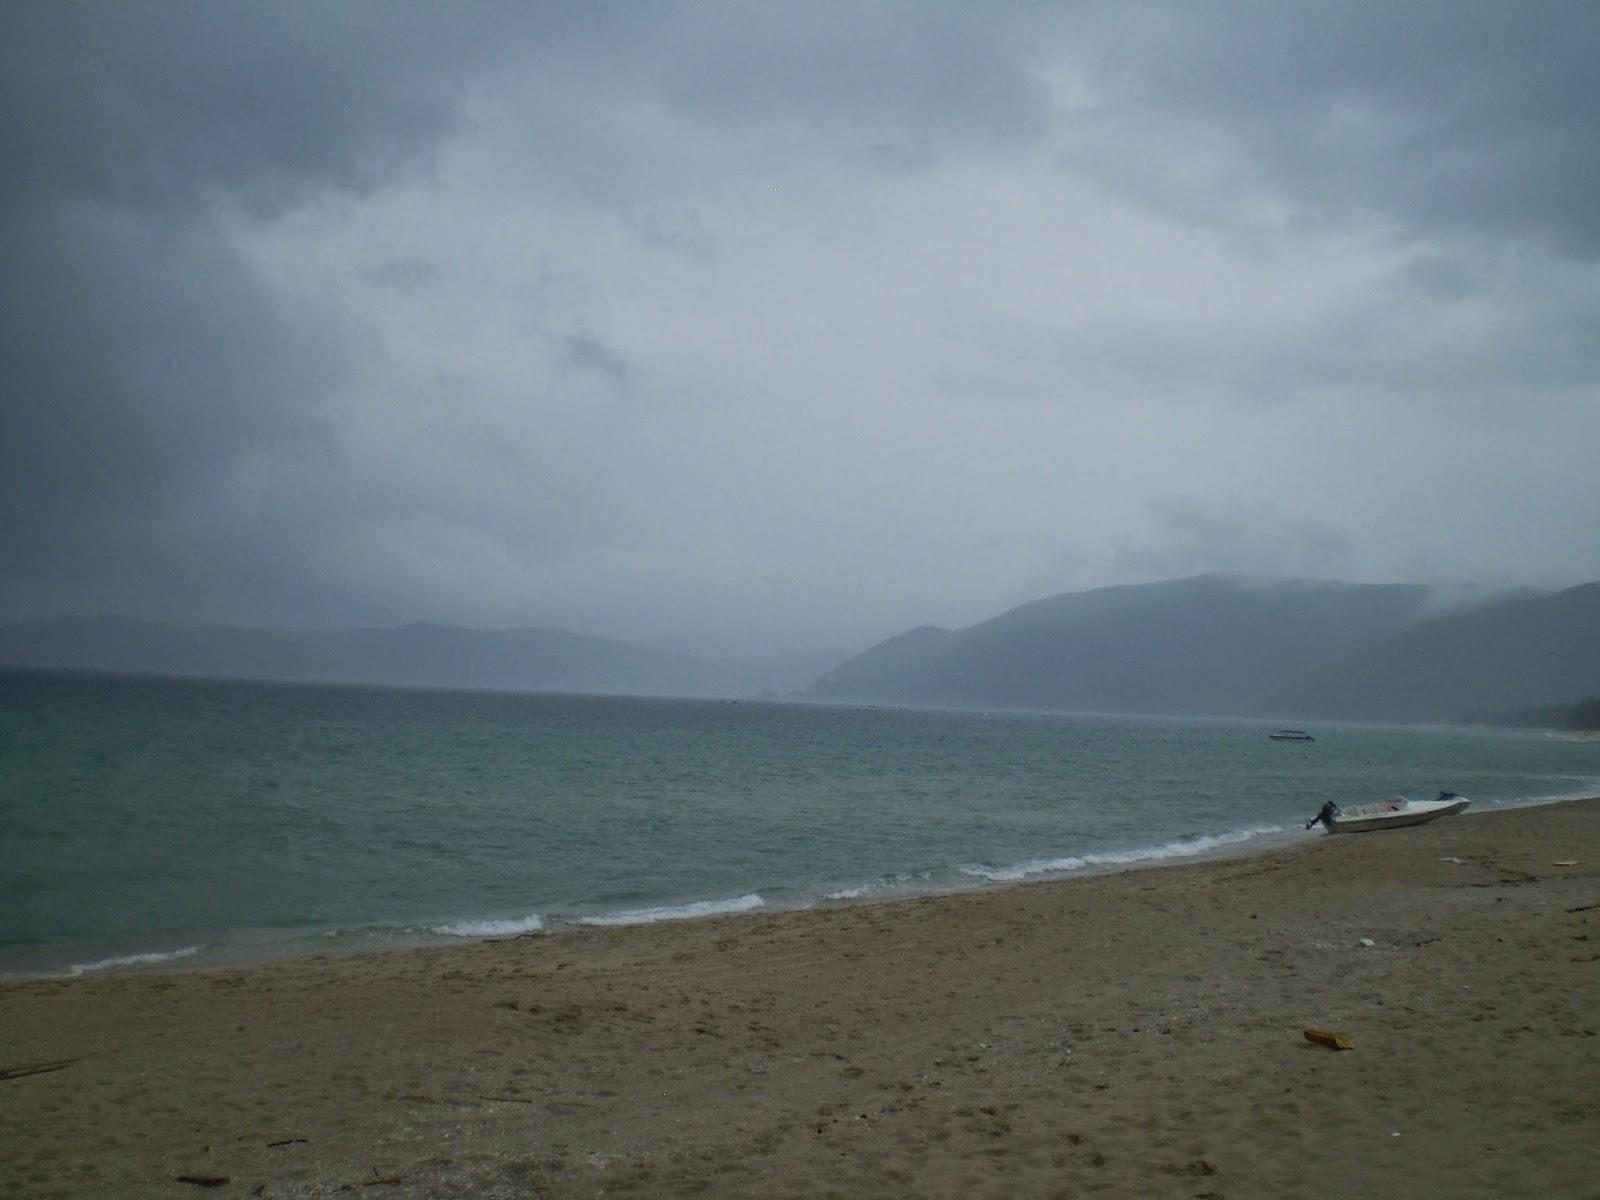 view rain nature and rain beach wallpaper 16 picture home design 3d download mac